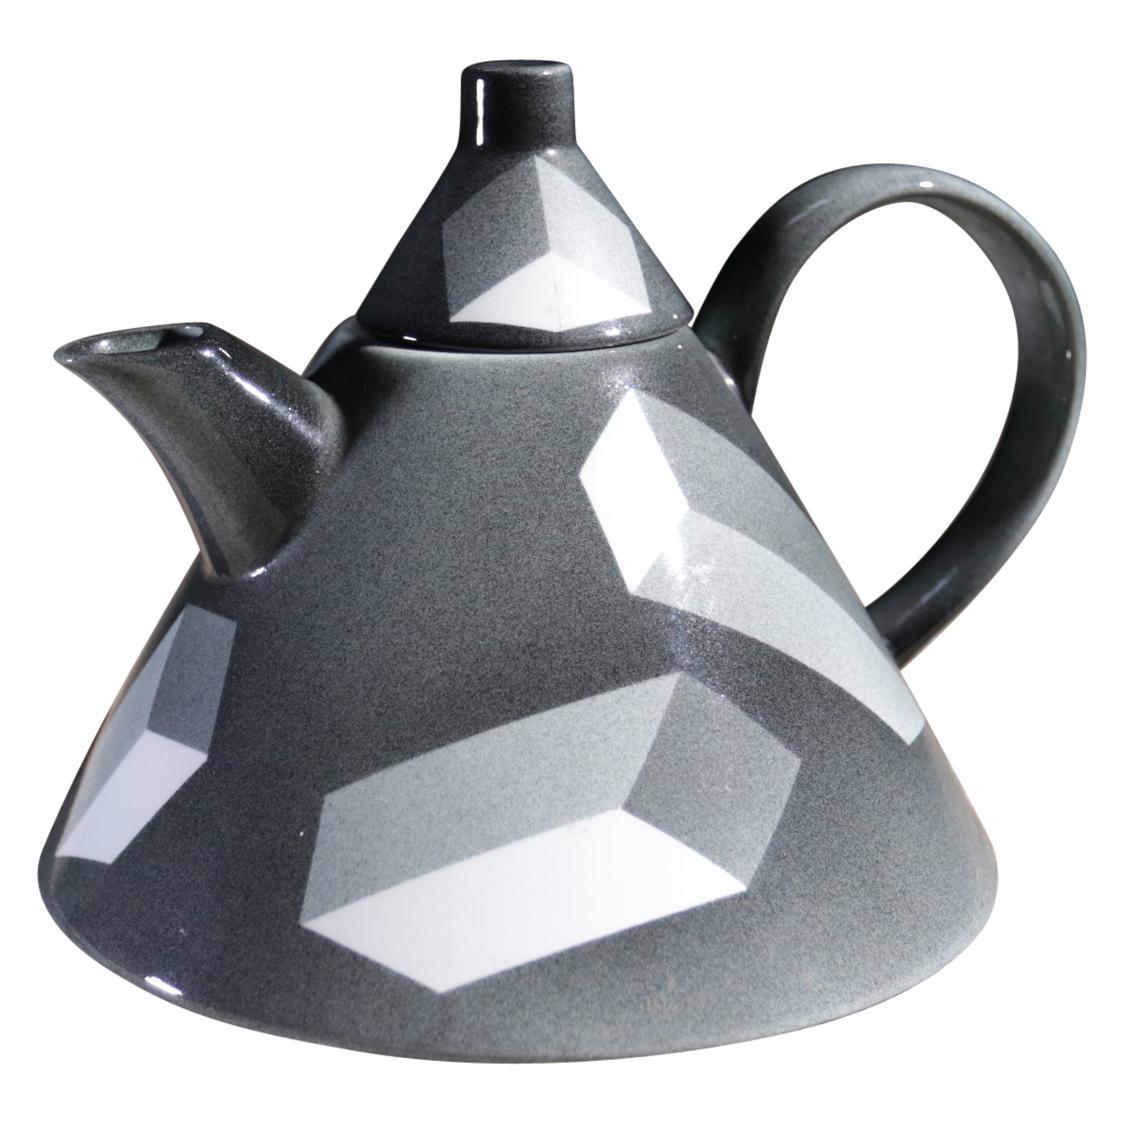 Rare Memphis Porcelain Rolf Sinnemark Rörstrand 'Atlantis' series Teapot 1984